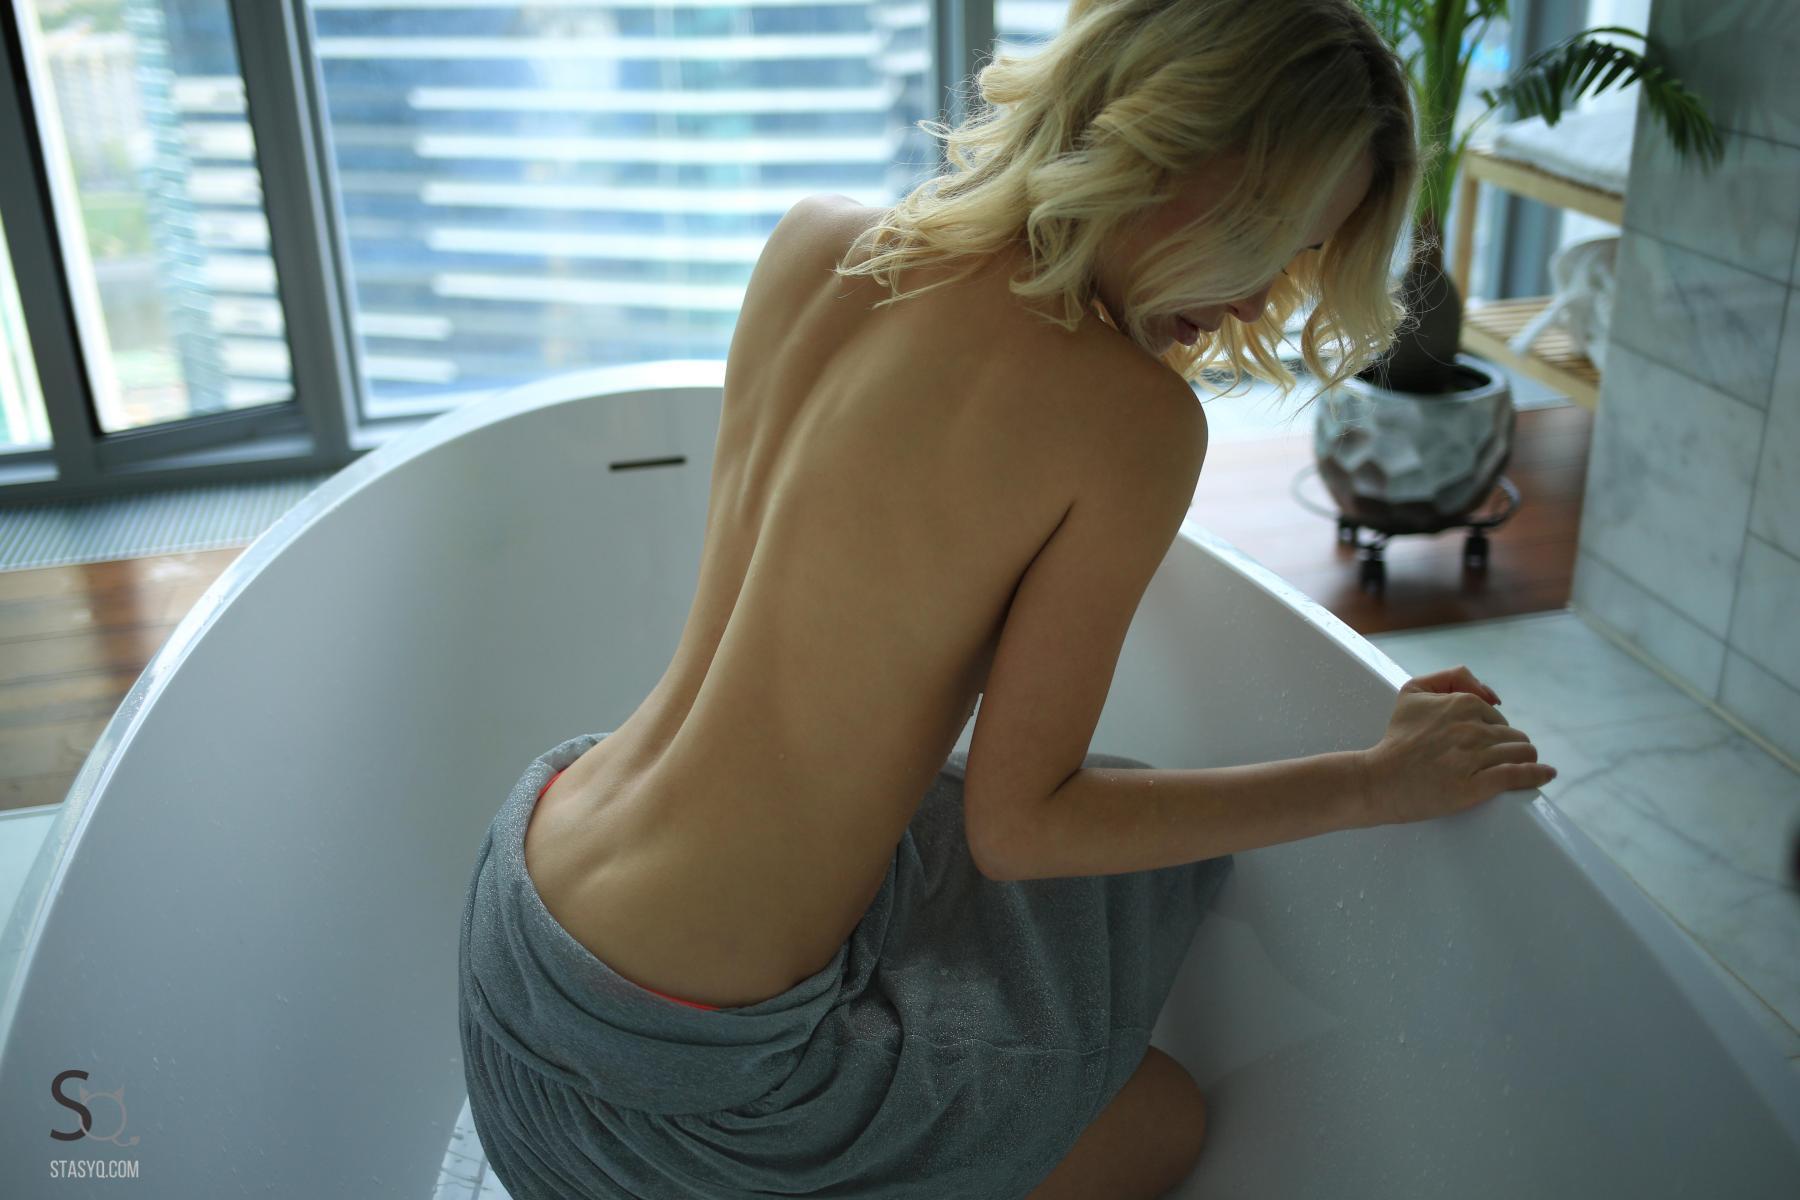 monroq-blonde-boobs-naked-bathroom-window-stasyq-22